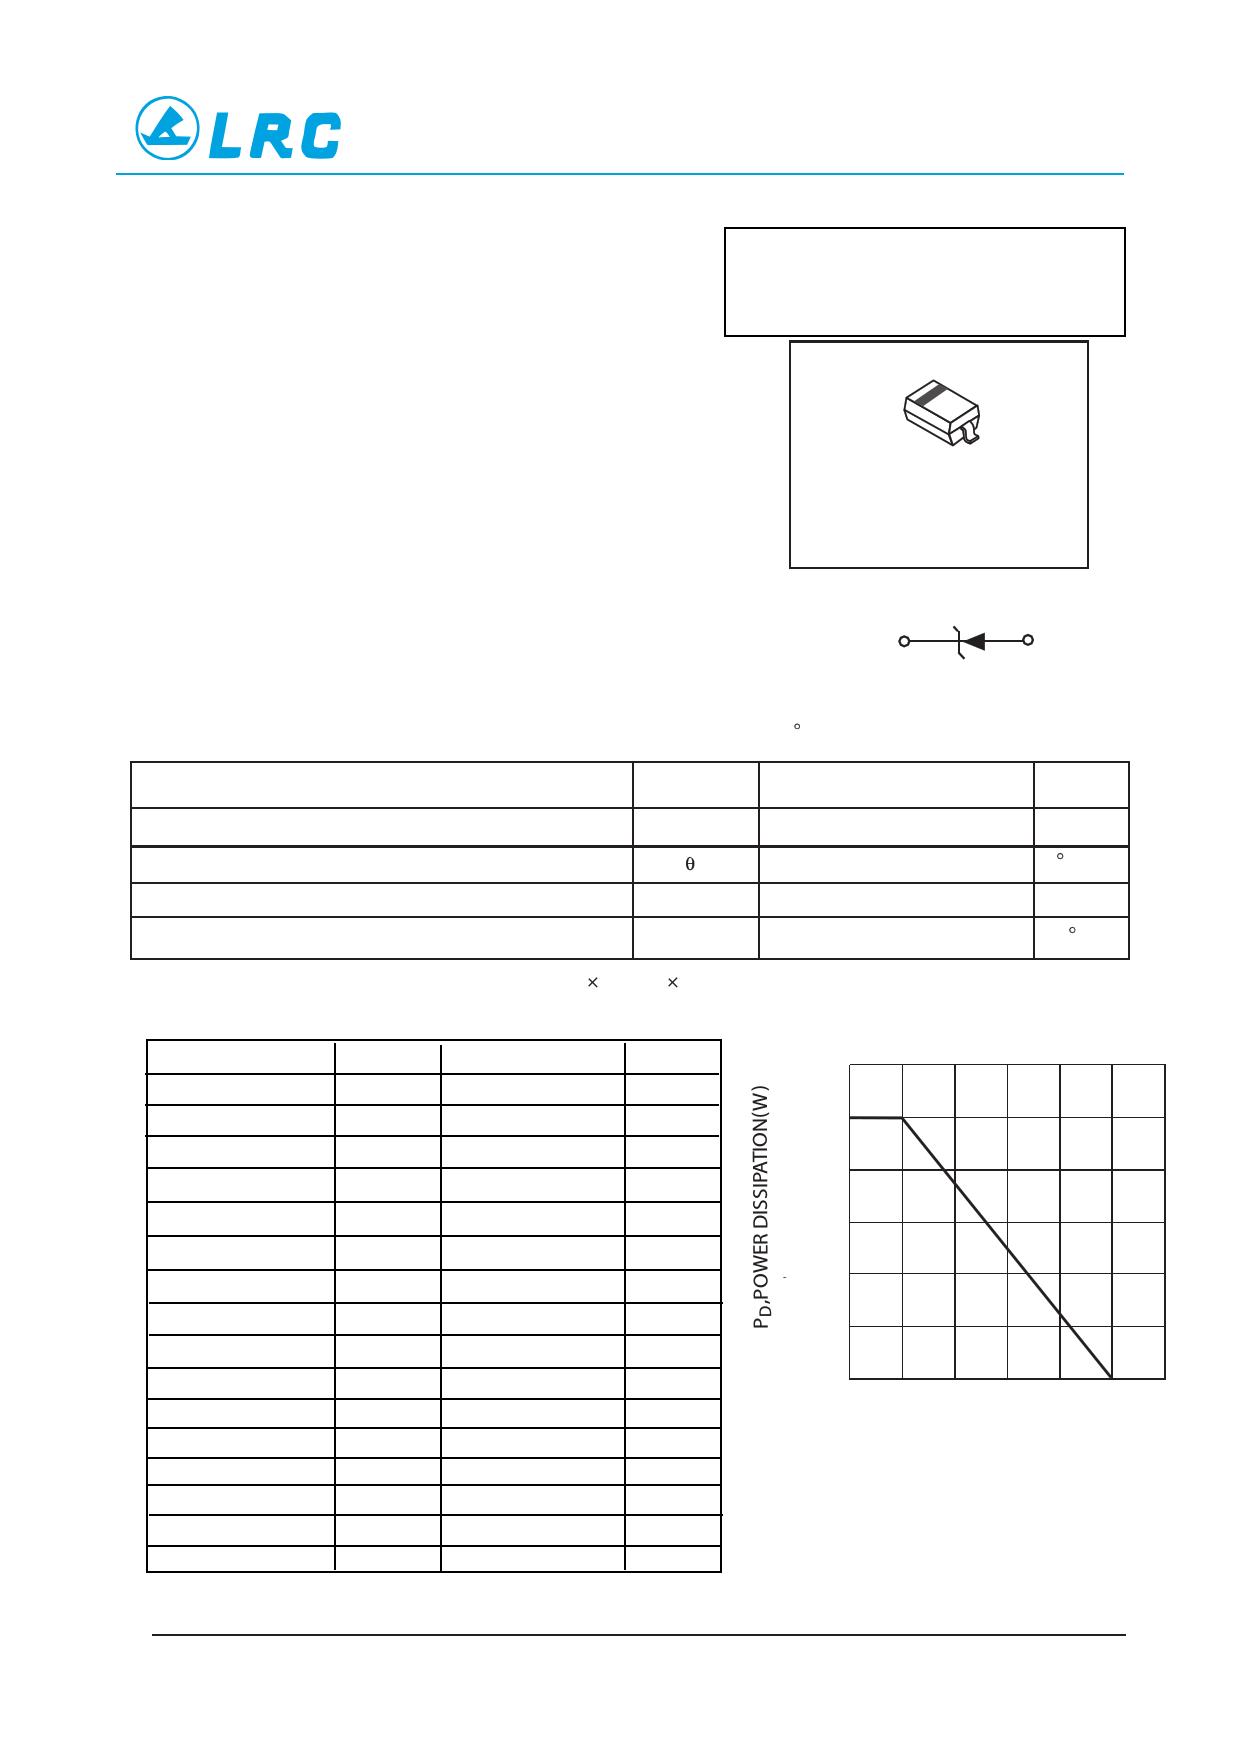 LBZT52B18T1G datasheet, circuit